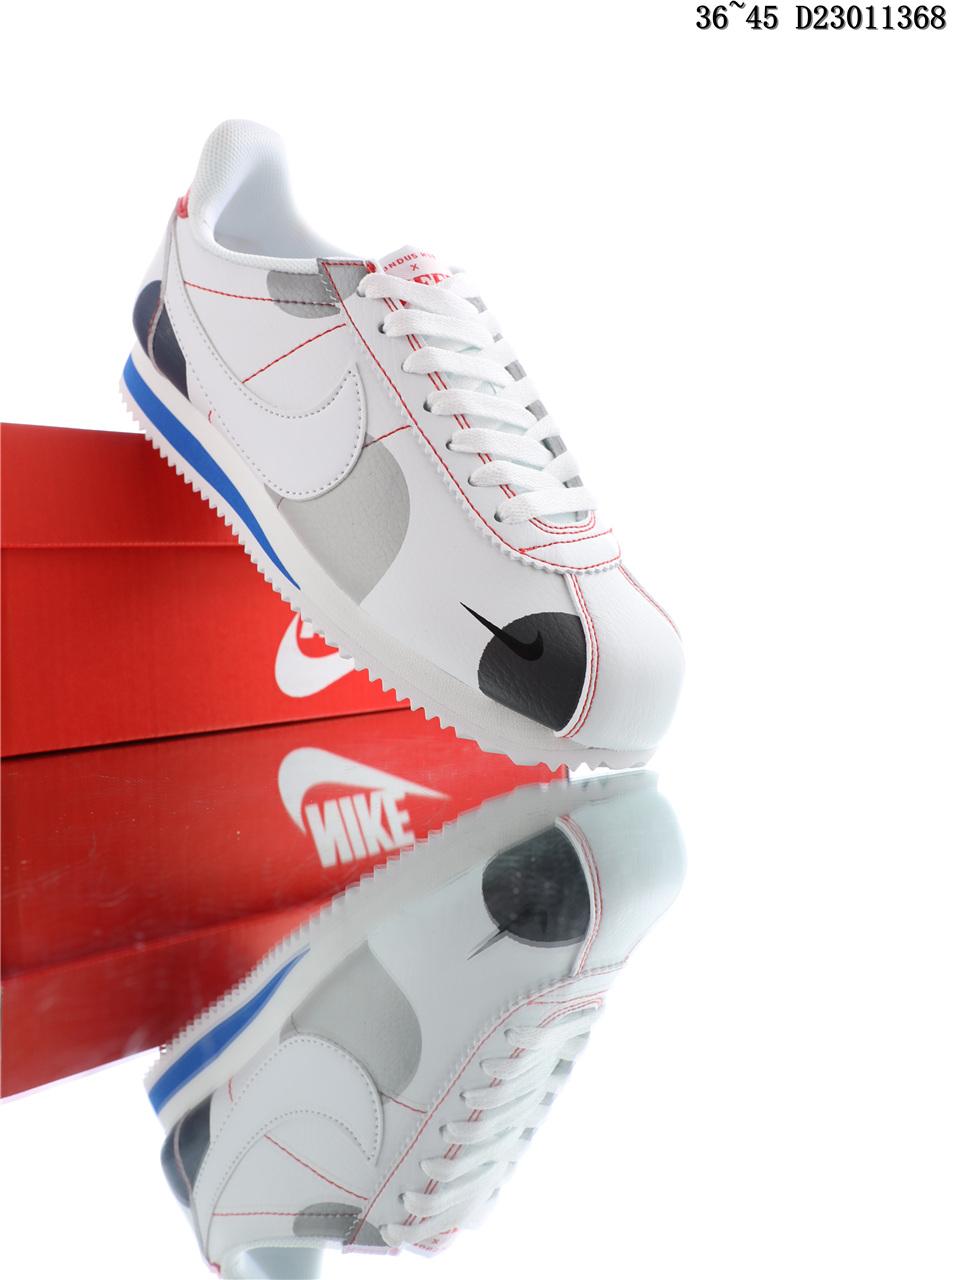 Nike Classic Cortez Running Shoes Black Gray Blue Shop